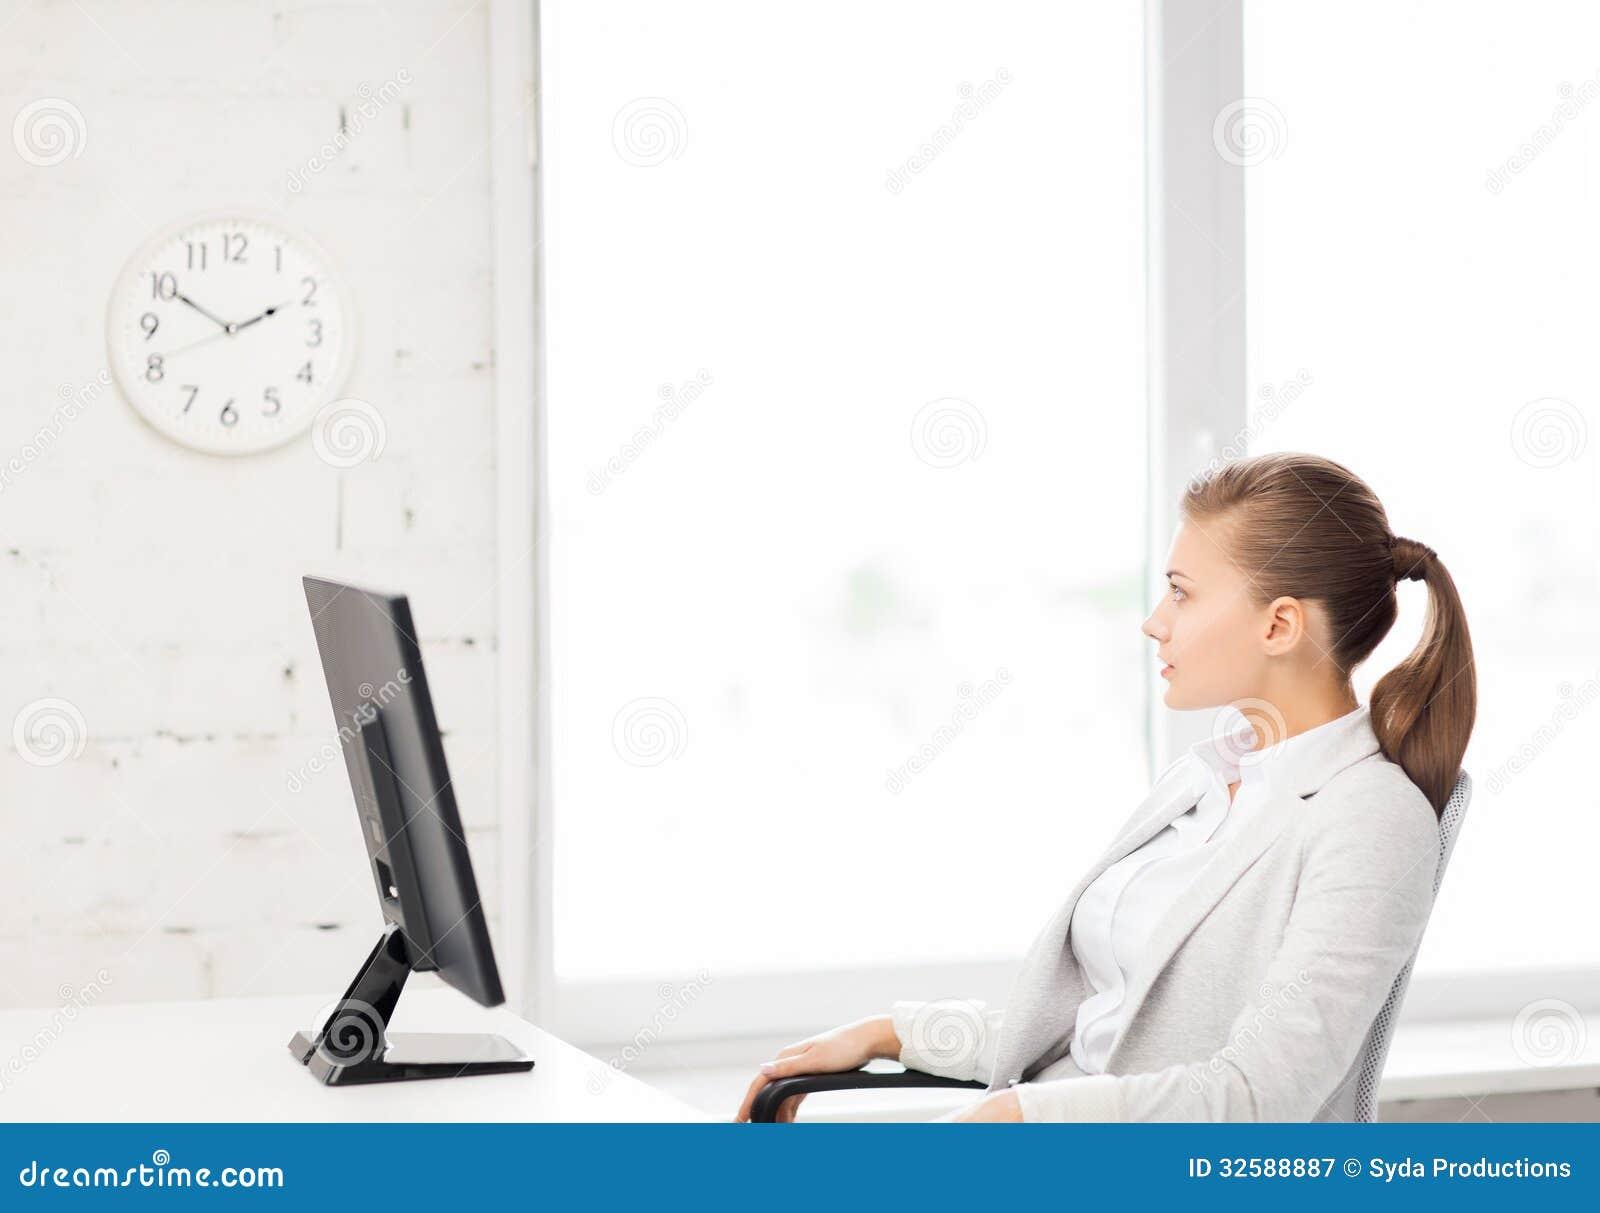 office clock wall. businesswoman clock looking office wall